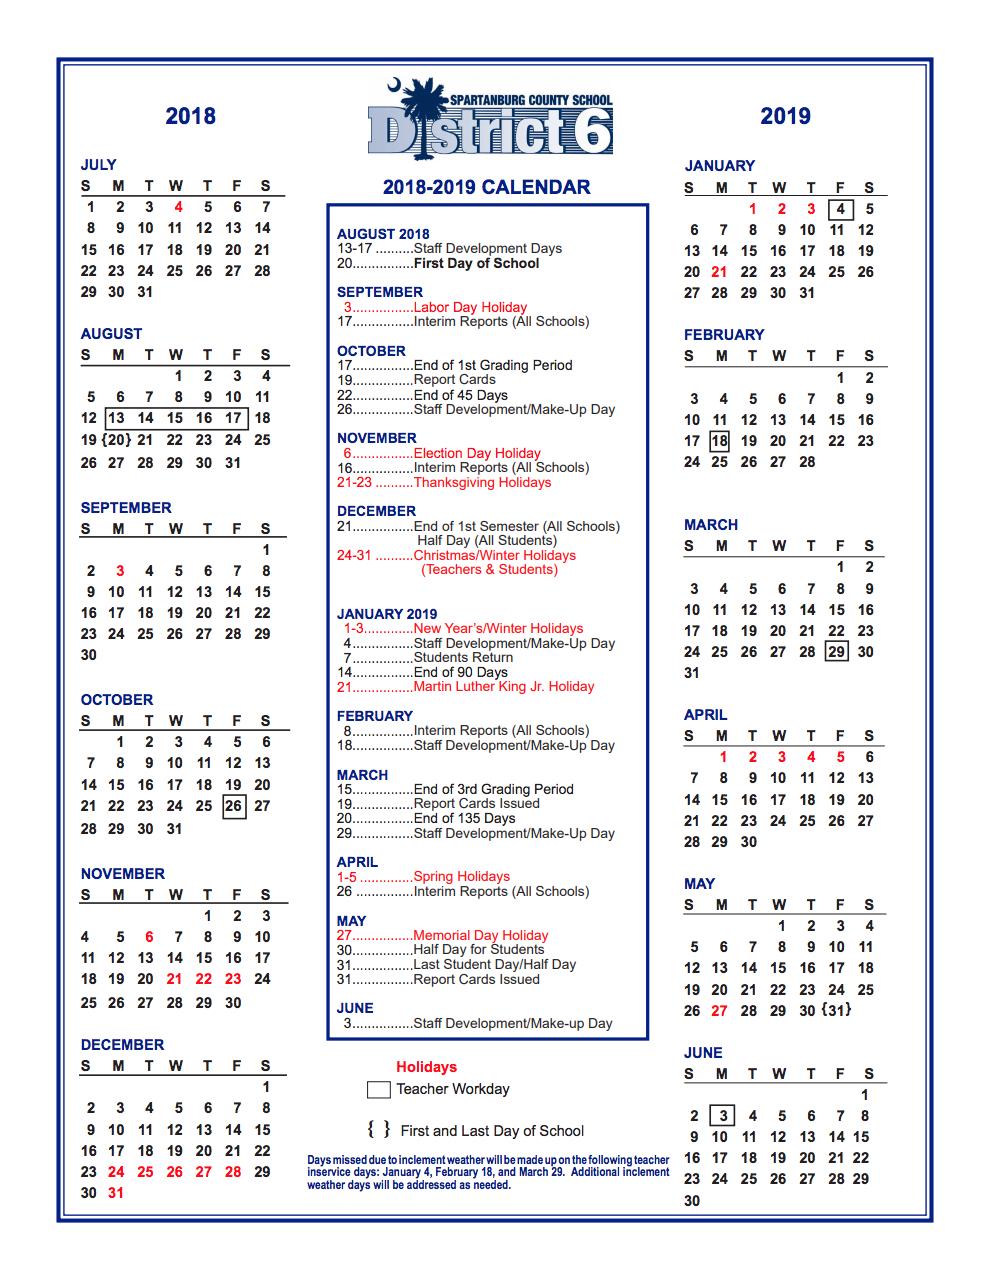 District Calendar – Parents – West View Elementary regarding Spartanburg School District 3 Calendar